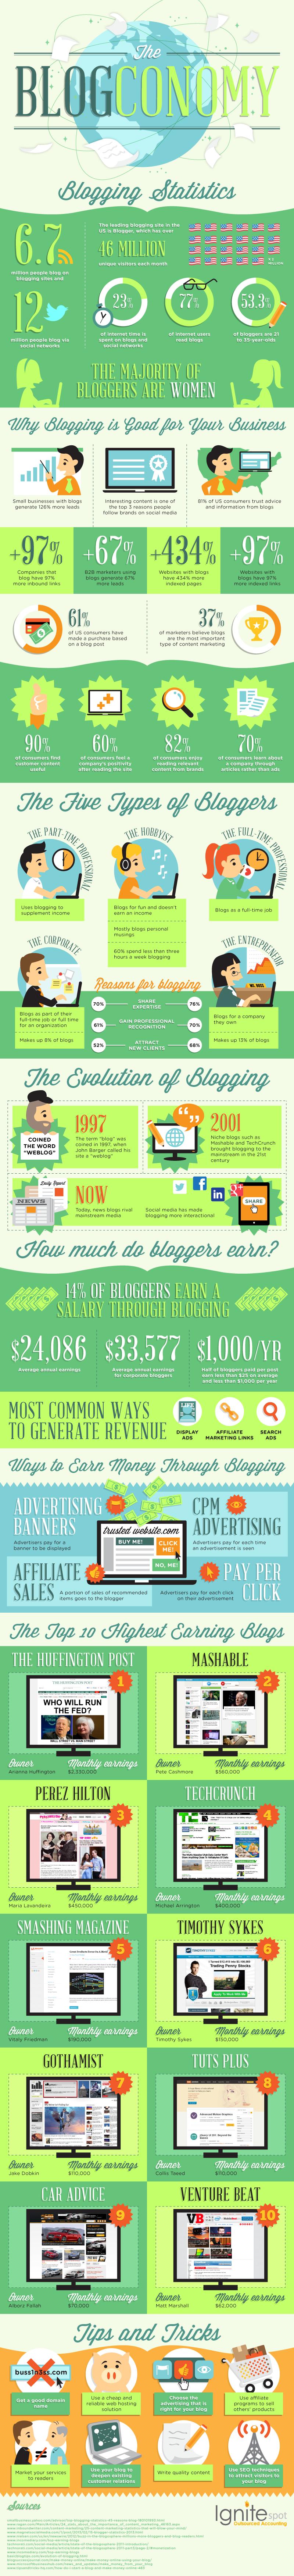 The #1 Small Business Marketing Idea